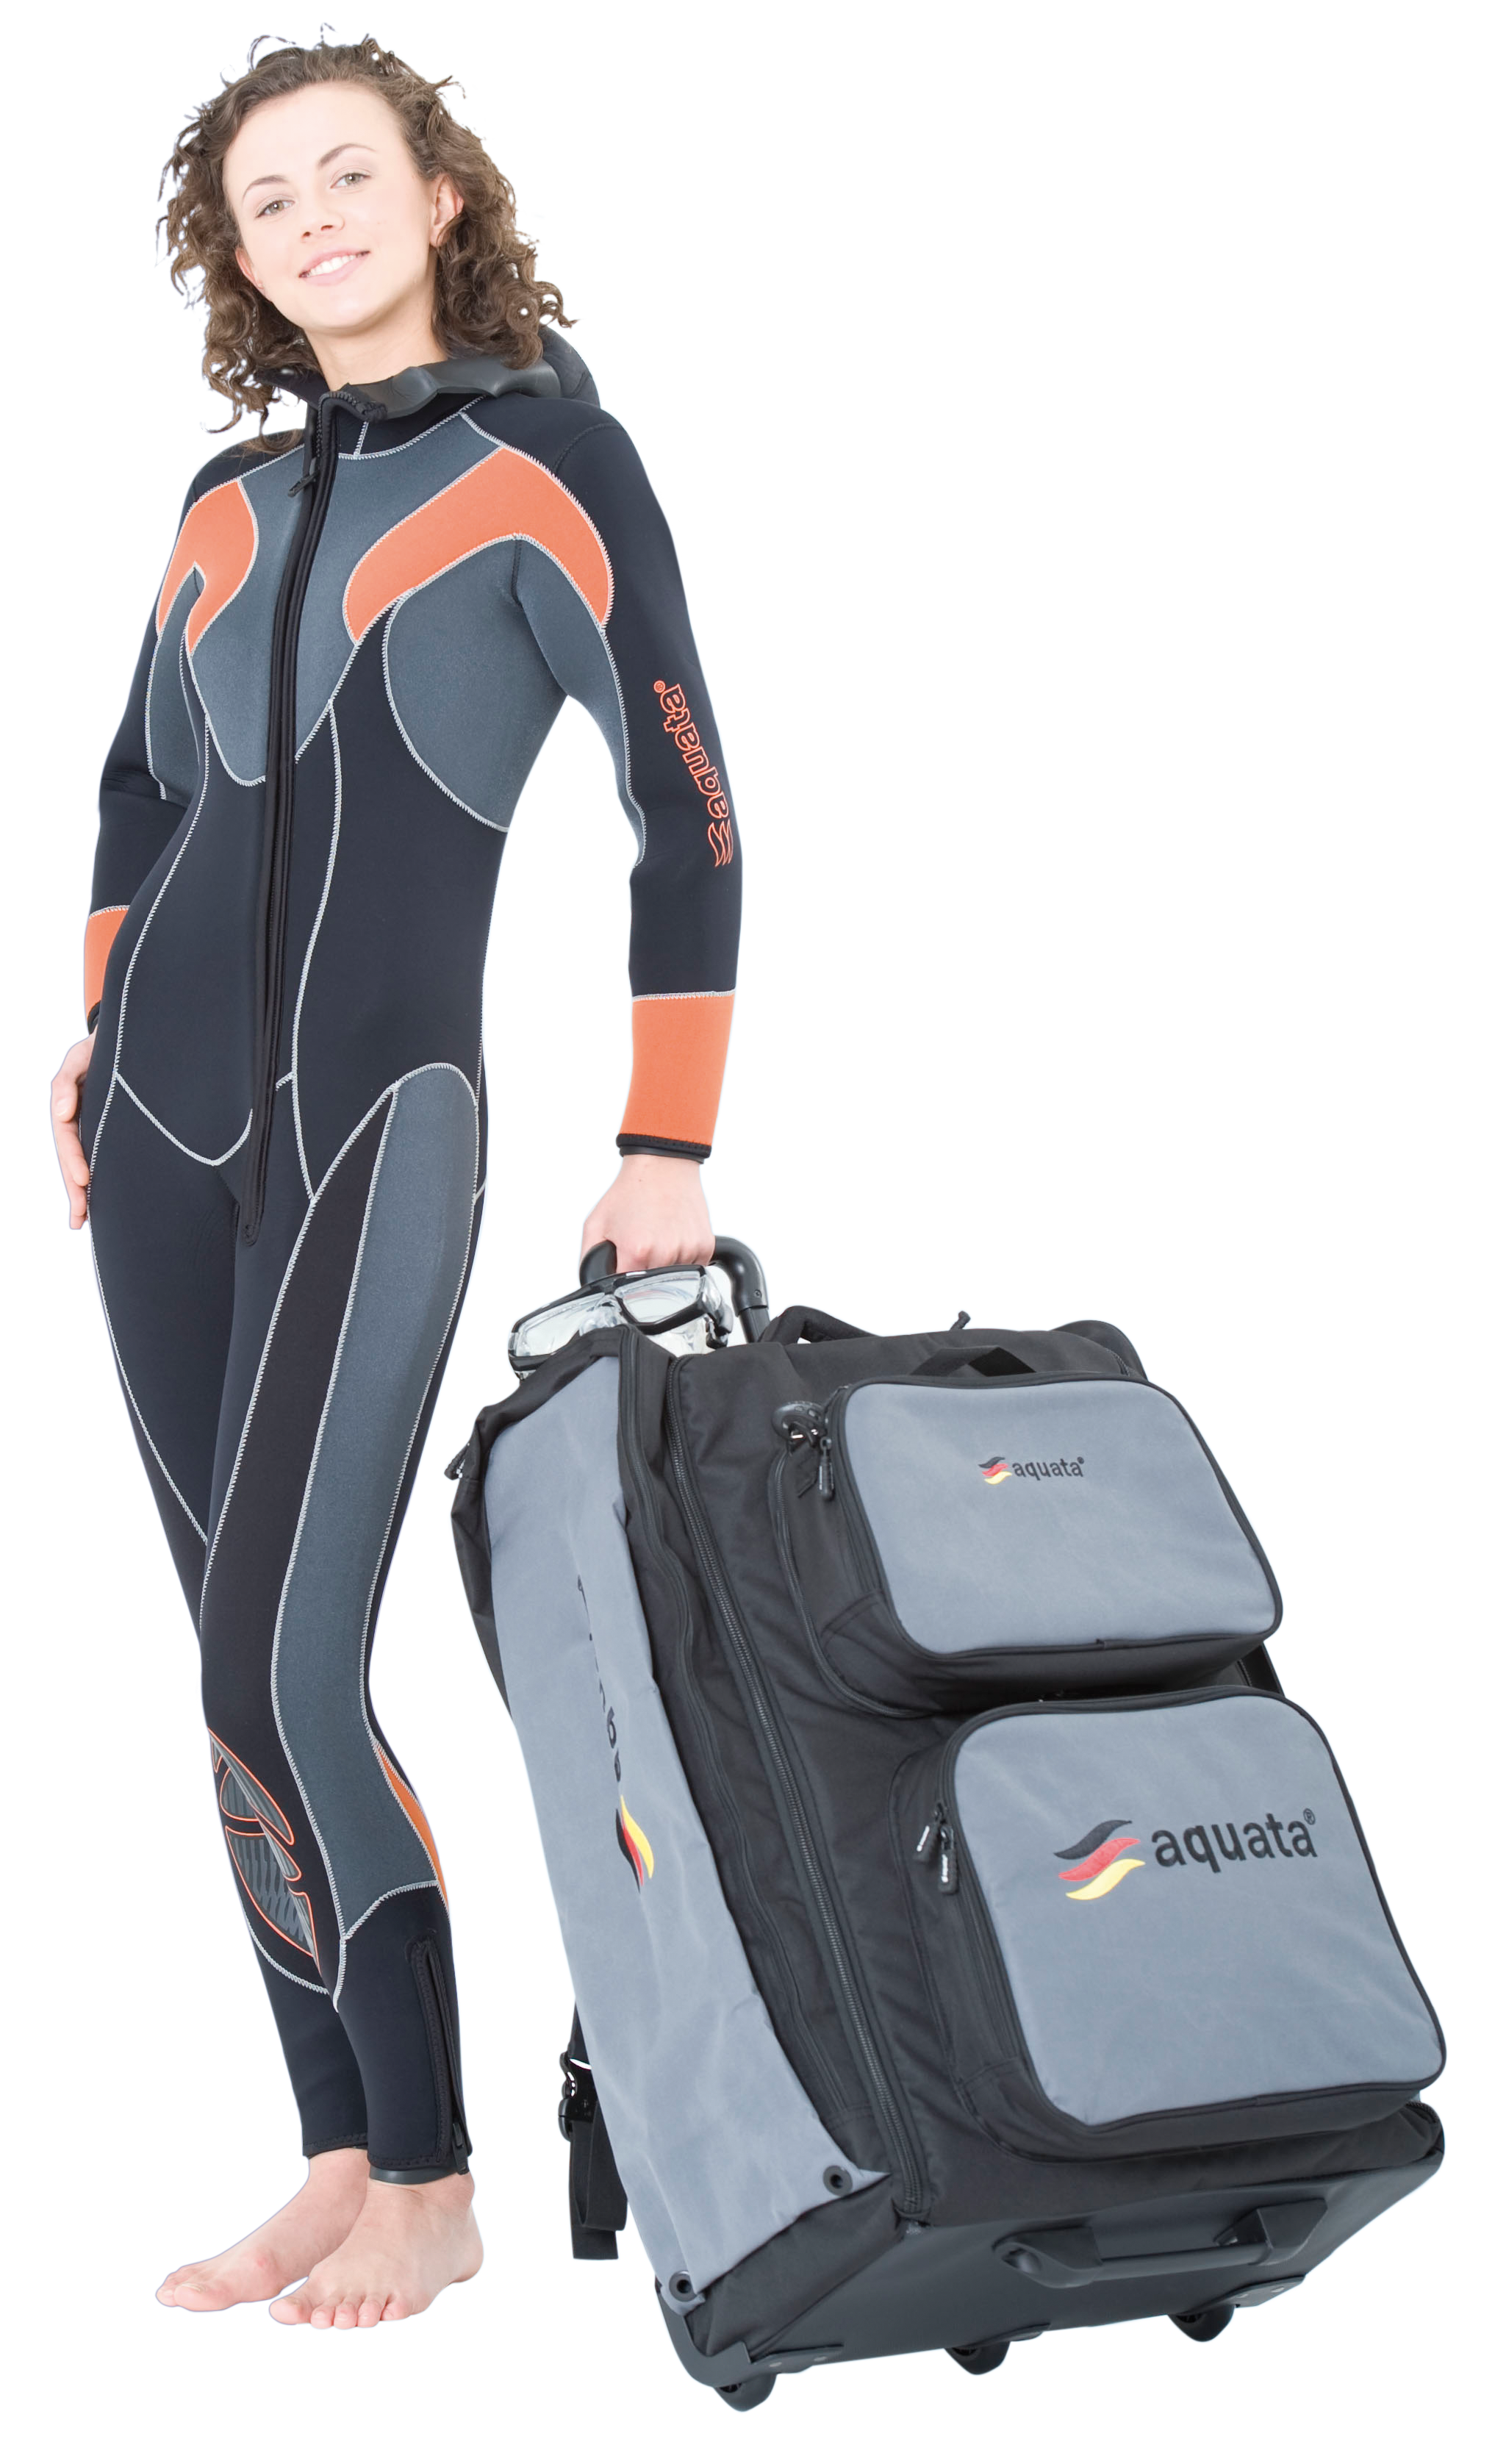 Halbtrocken Tauchanzug Overall   Damen  mit fester Haube  Modell  Nord Eco 9